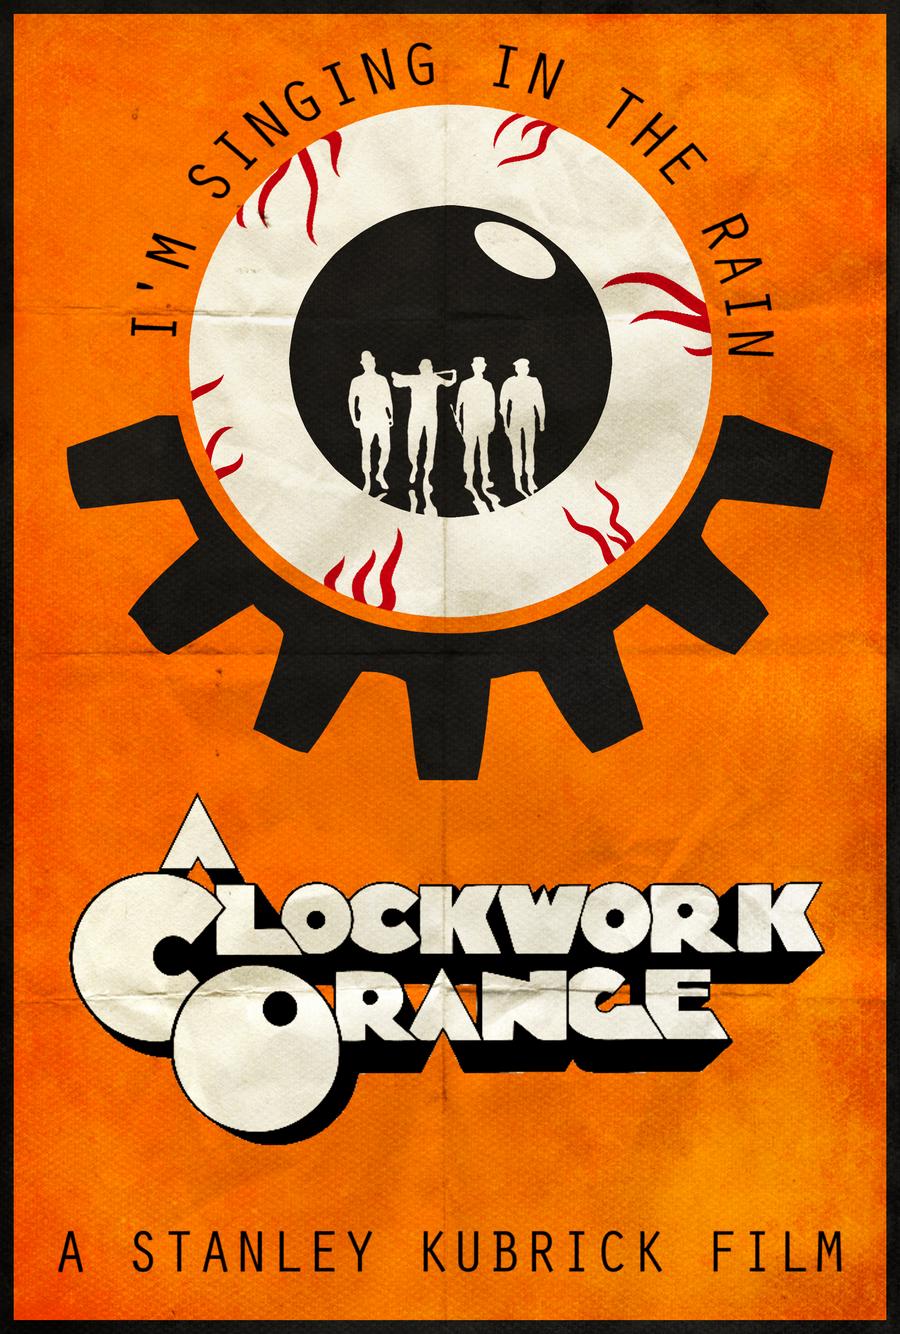 A Clockwork Orange - Alt. Minimalist Poster by ...